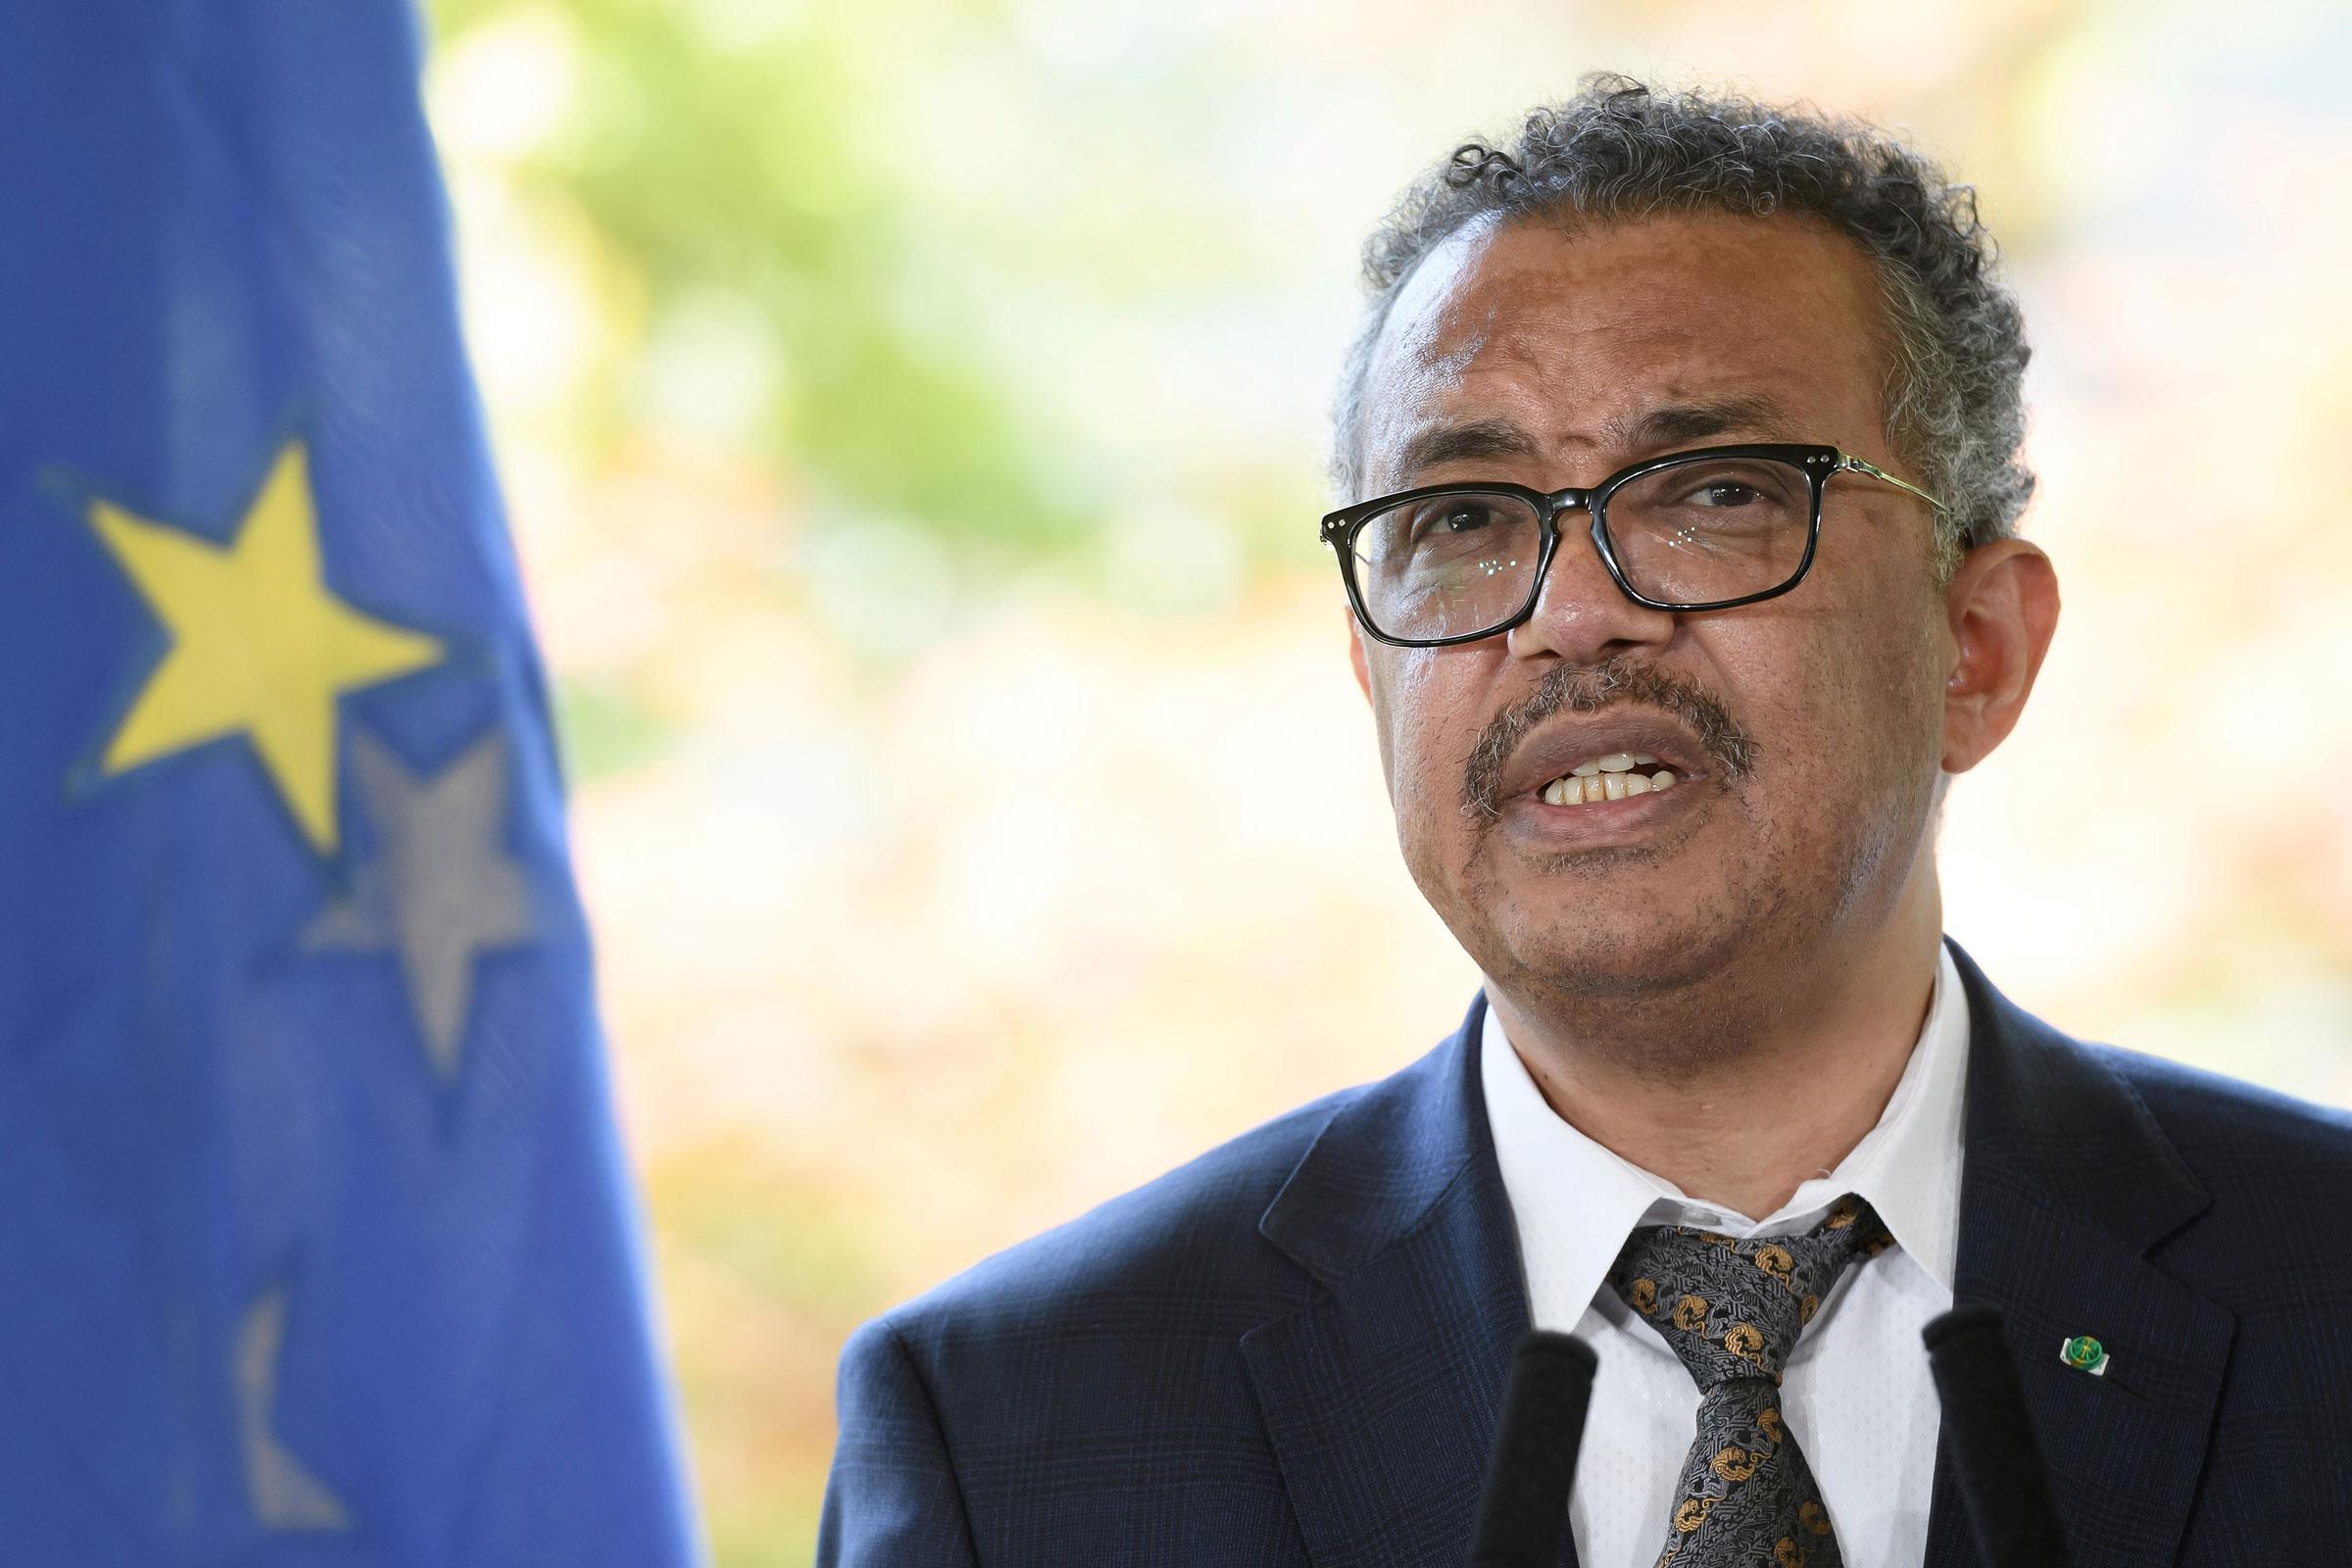 World Health Organization Director-General Tedros Adhanom Ghebreyesus speaks at a news conference on Thursday.